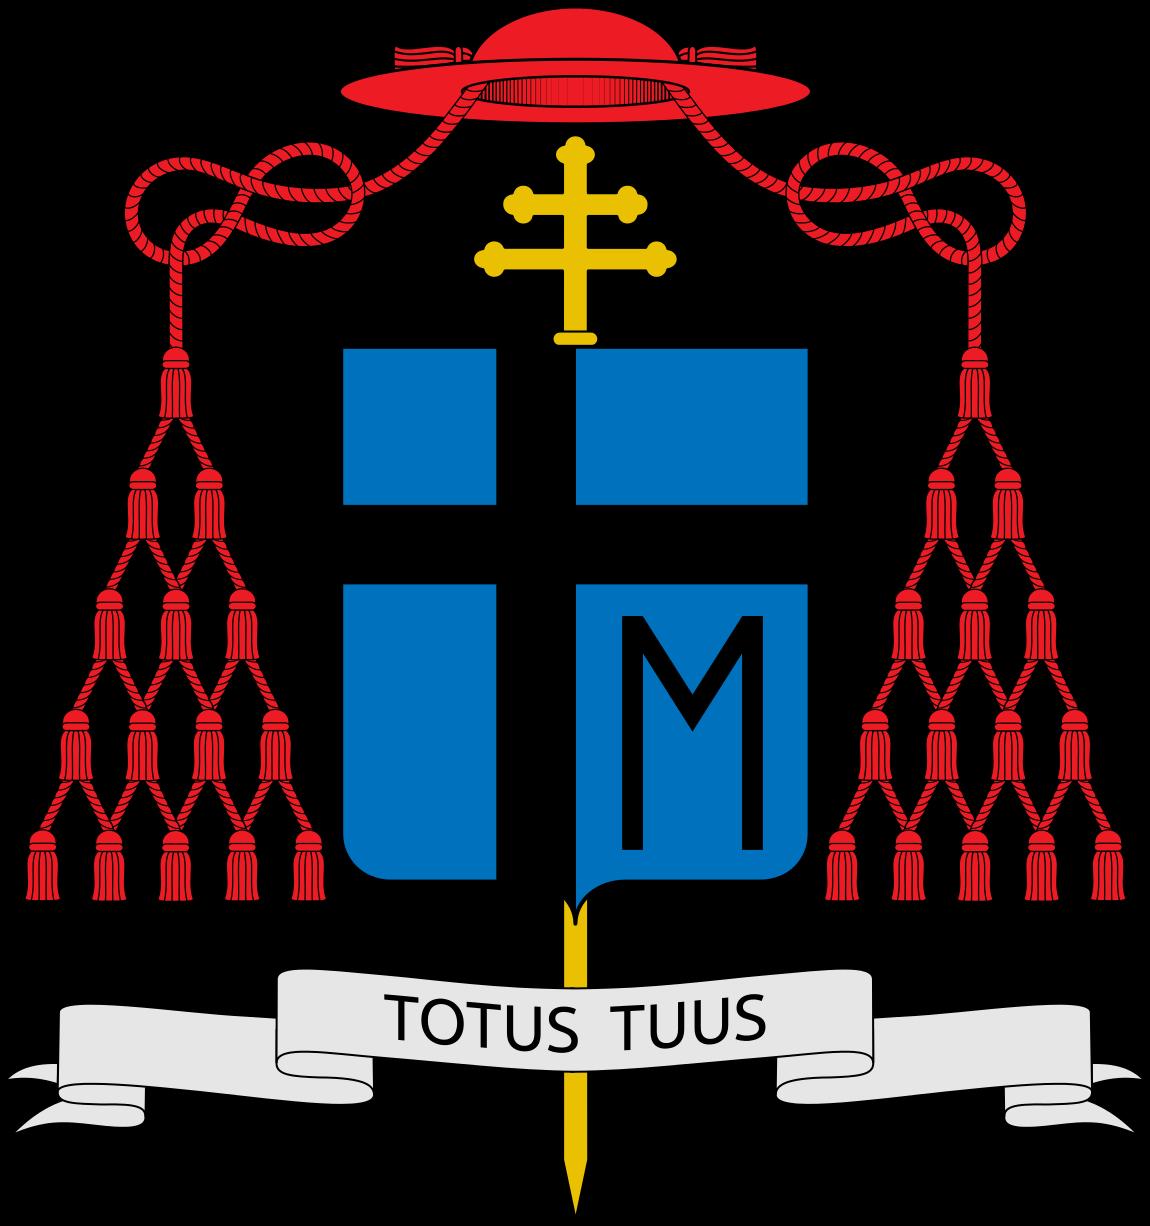 Coat of arms if cardinal karol jzef wojtya later to be pope john coat of arms if cardinal karol jzef wojtya later to be pope john paul ii buycottarizona Choice Image